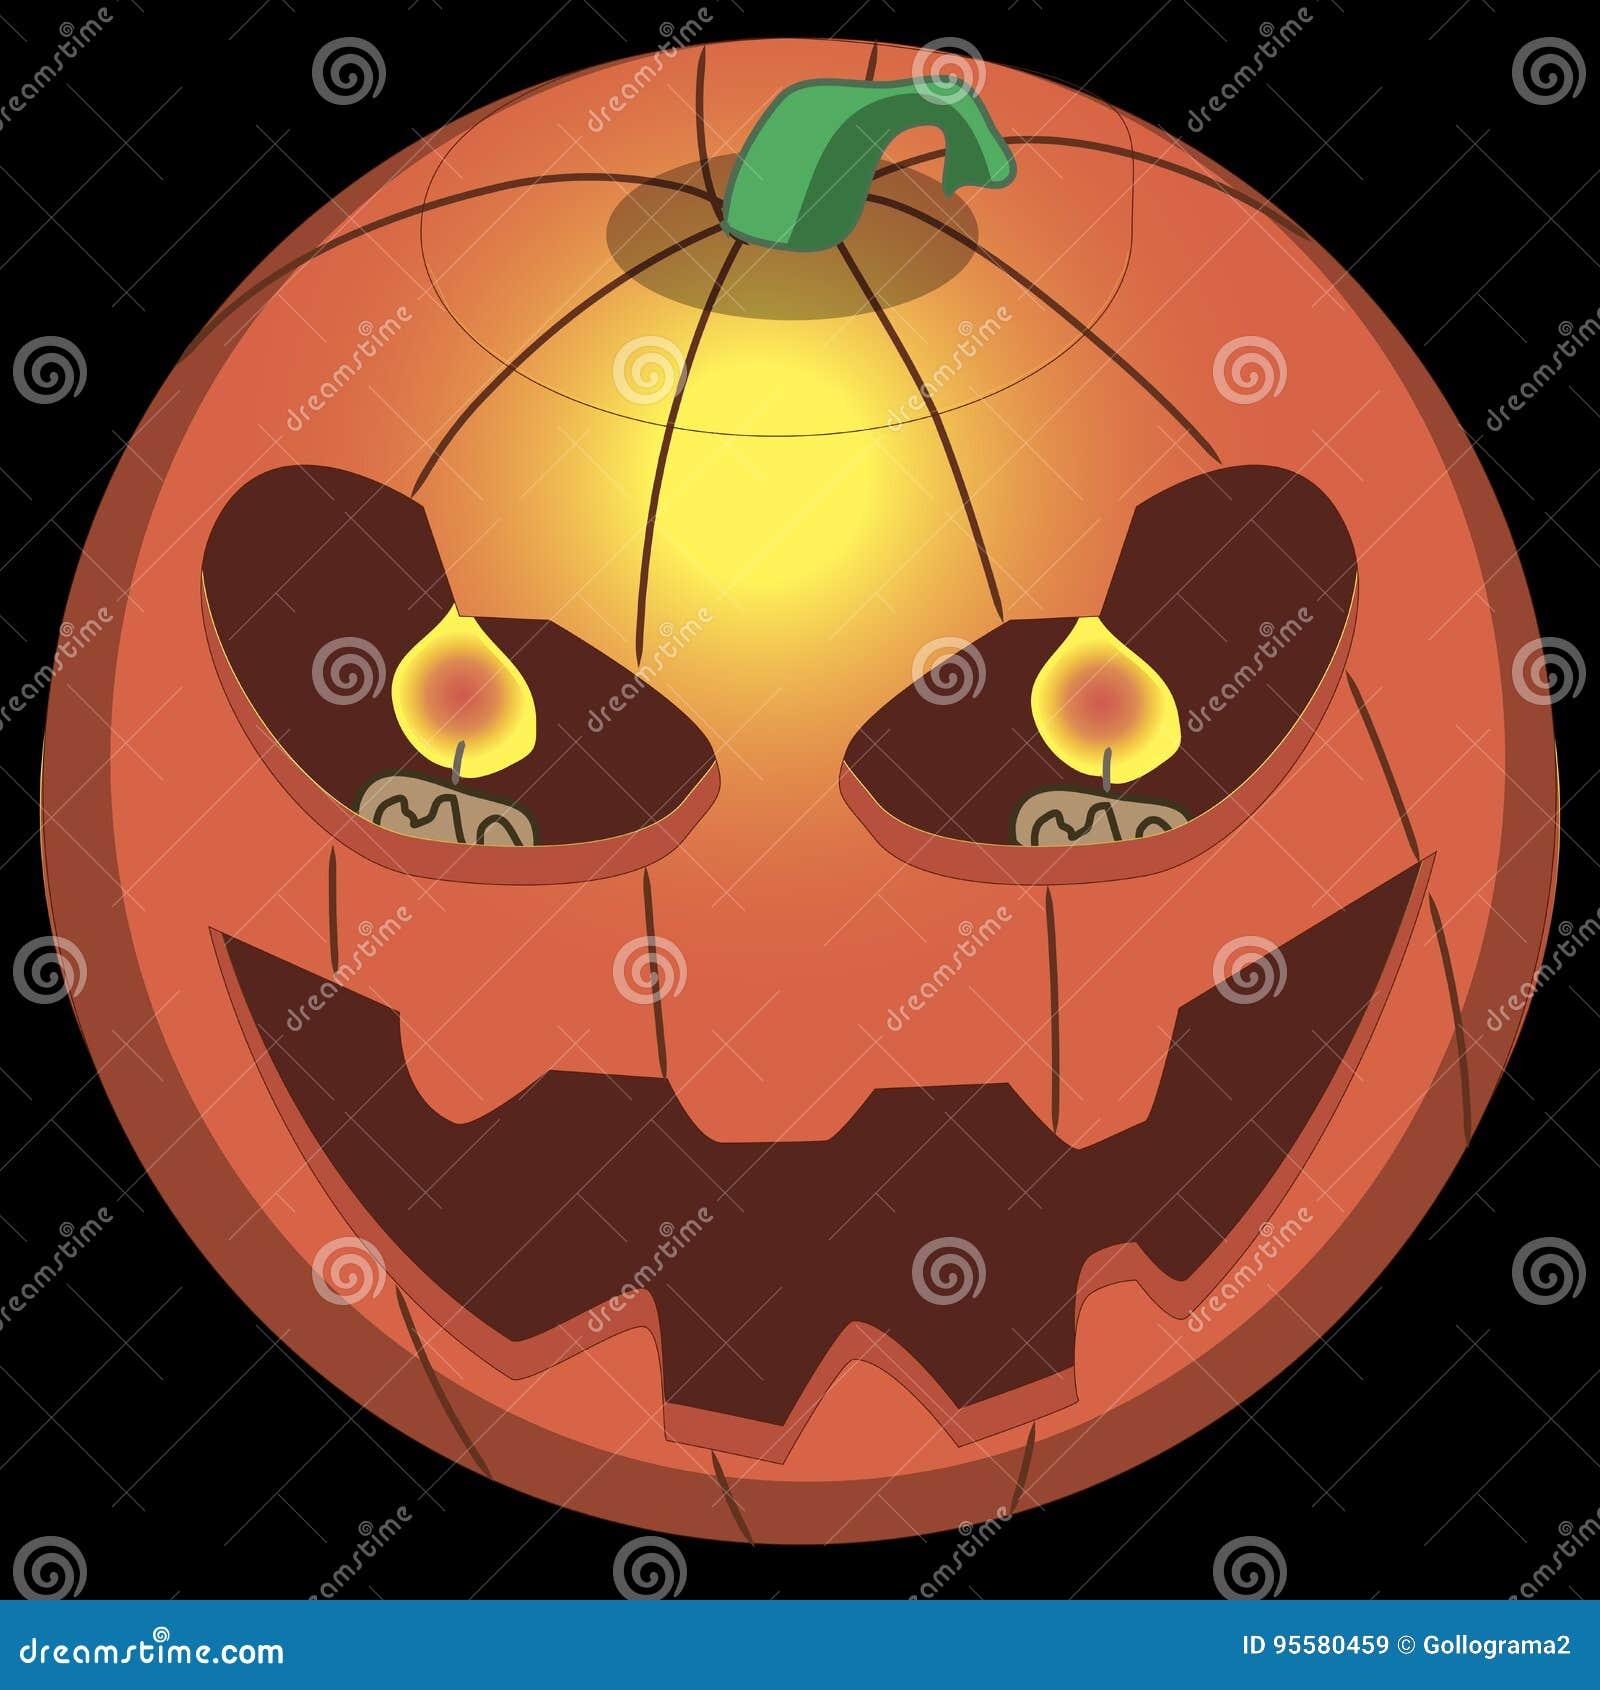 Monster emoji smiley face Halloween pumpkins